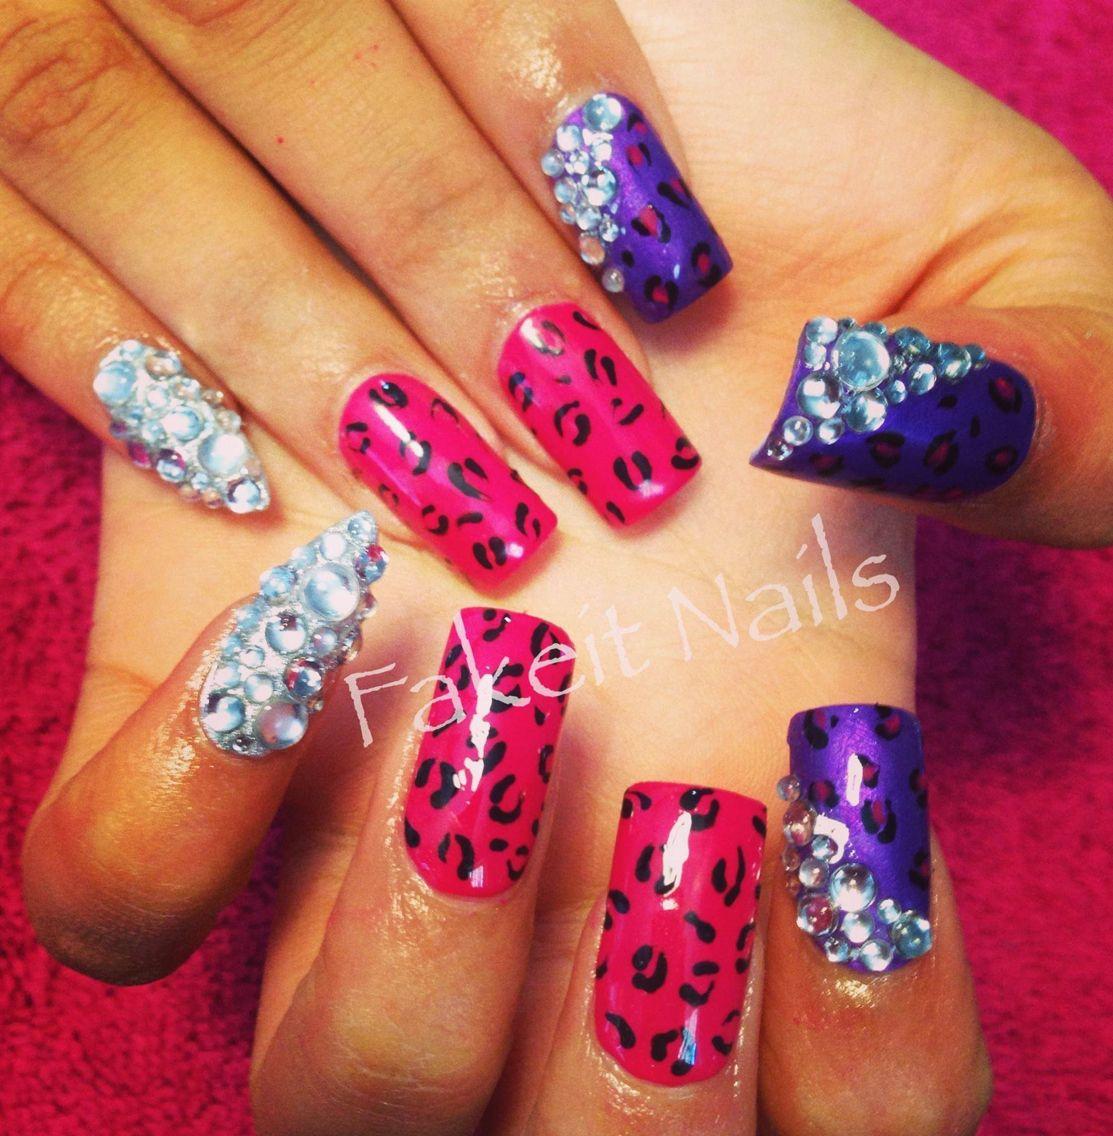 Leopard print & diamond acrylic nails by Fakeit Nails | Fakeit Nails ...